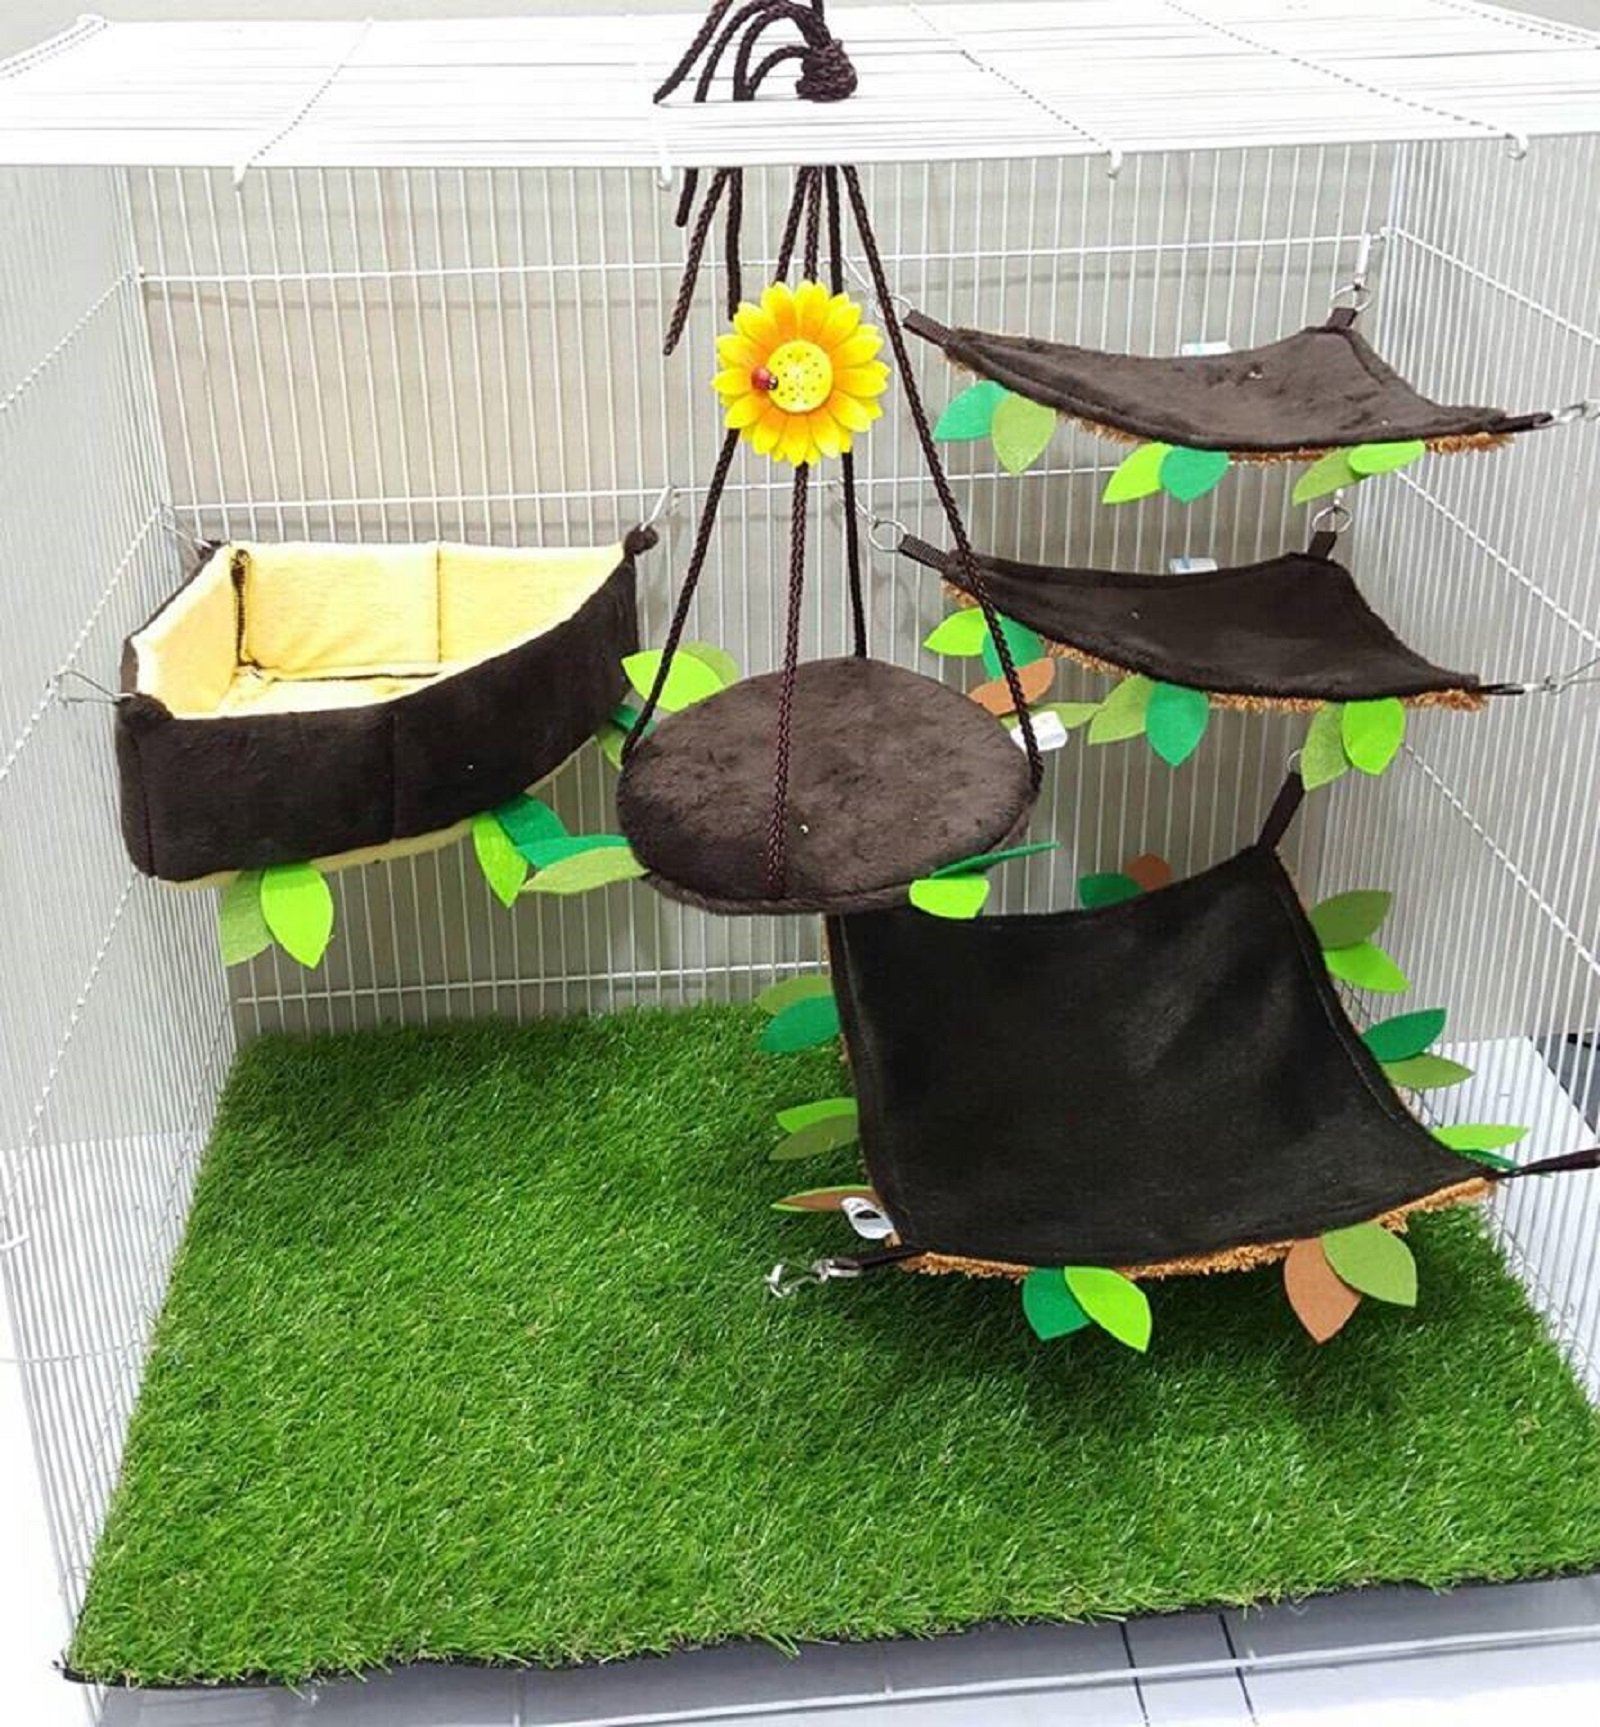 5 Pcs Sugar Glider Hamster Squirrel Chinchillas Small Pet Edge Cushion Cage Set Forest Pattern Get Free 1 Small Pet Treats, Polar Bear's Republic